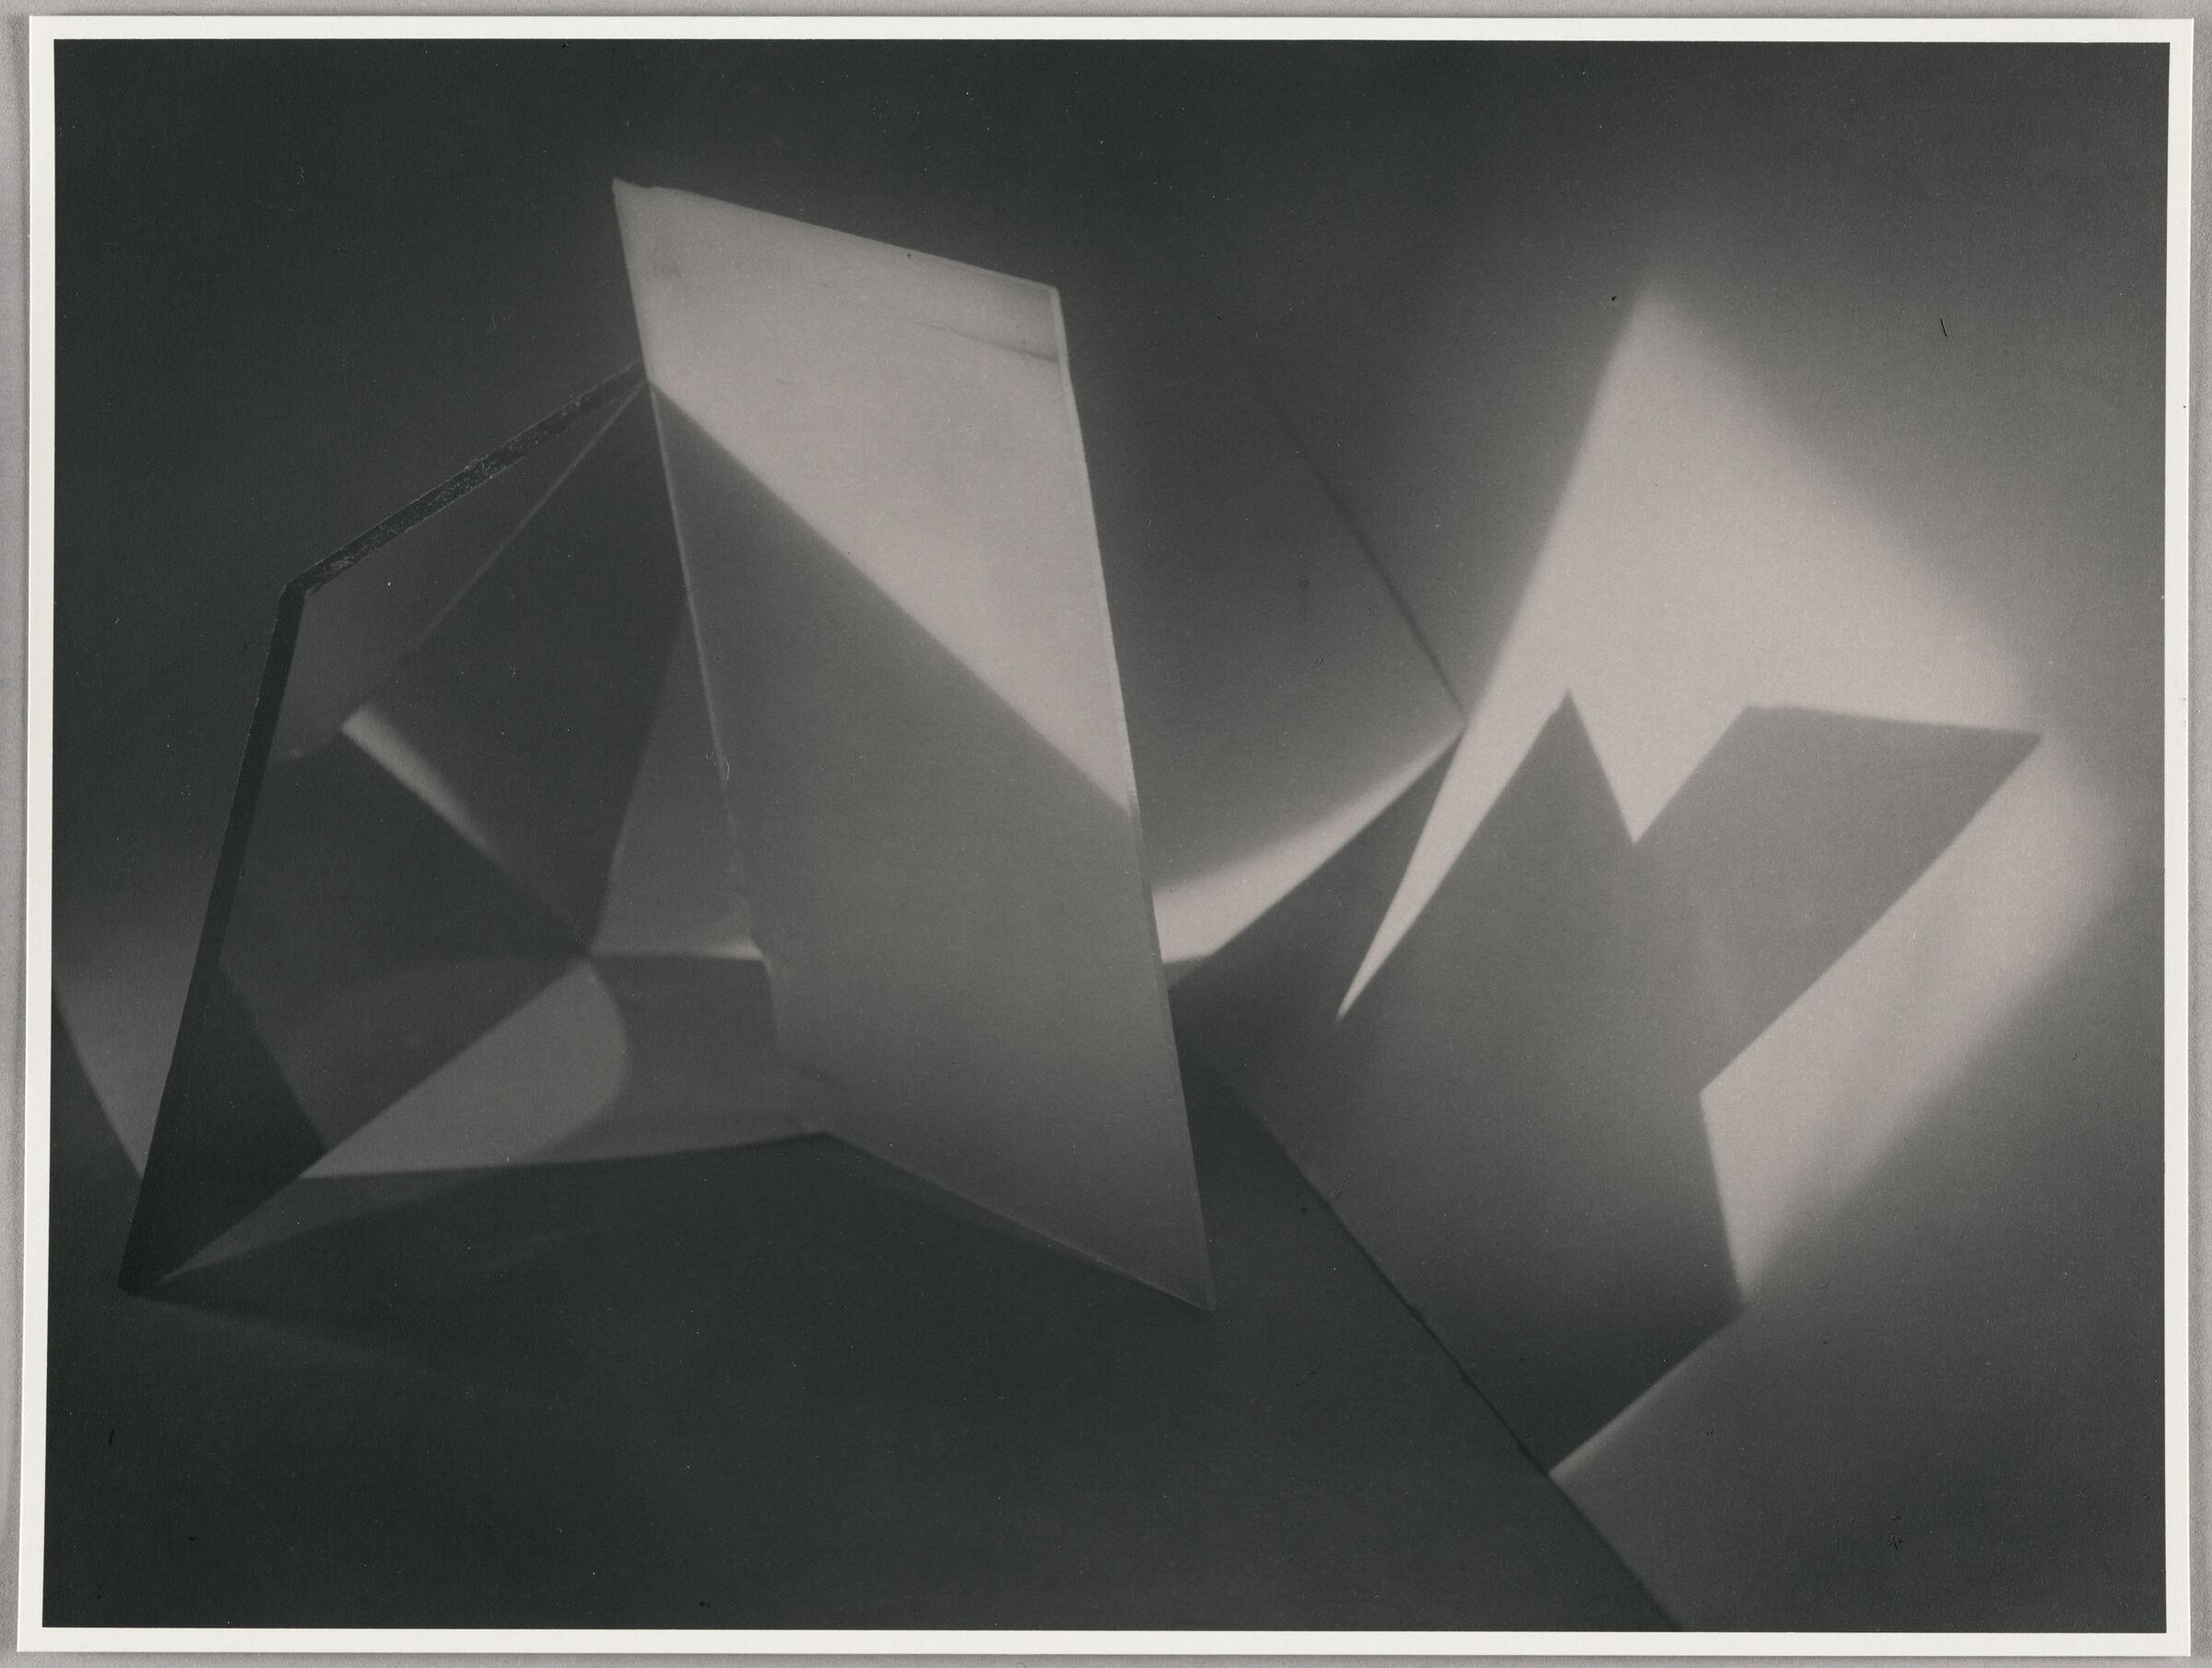 Composition: Glass Plates